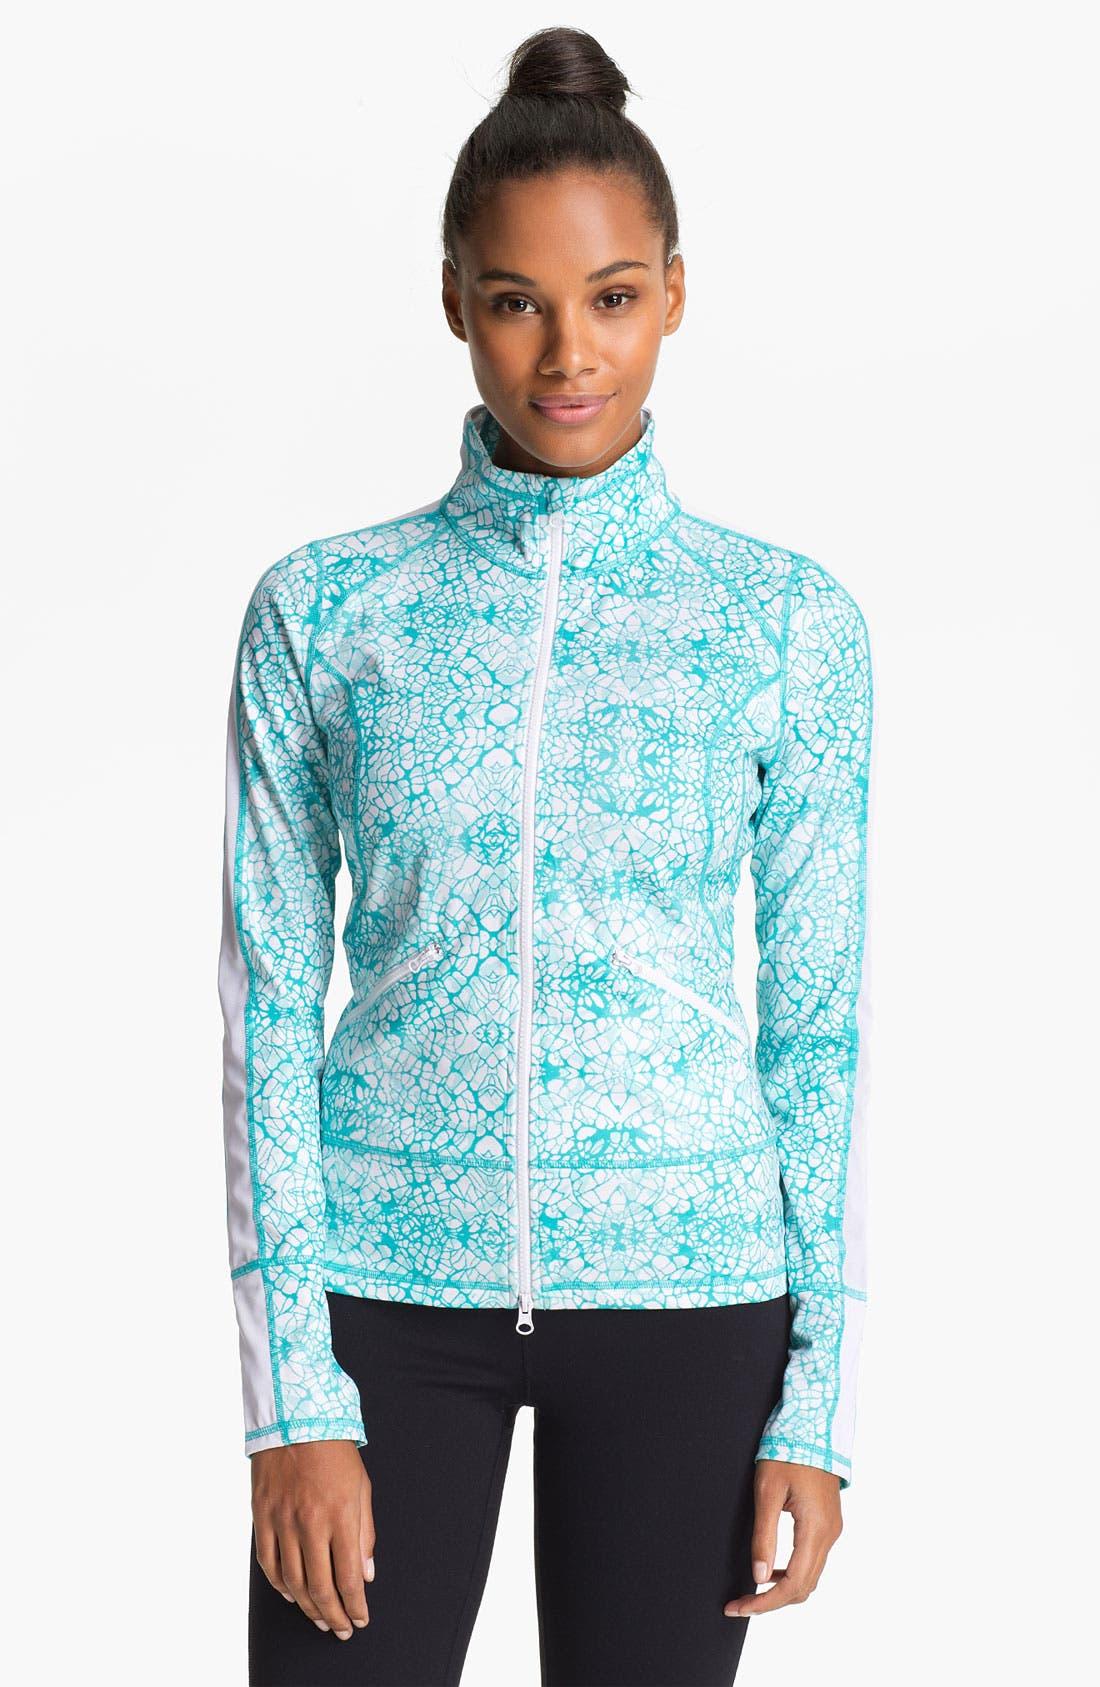 Main Image - Zella 'Streamline' Print Jacket